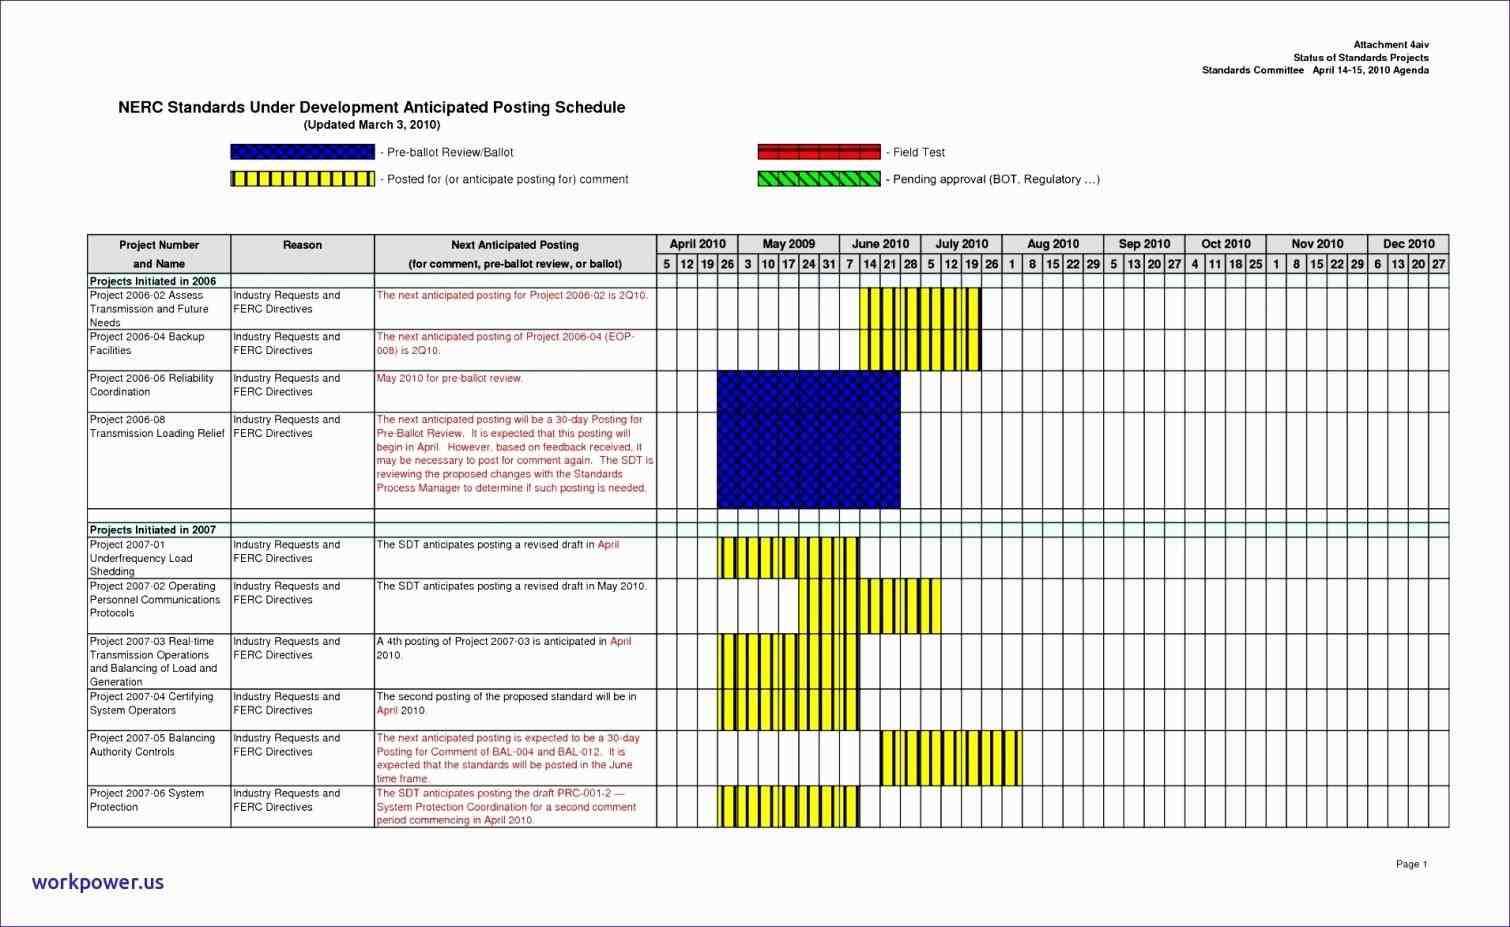 simple gantt chart template excel download - Ideal.vistalist.co